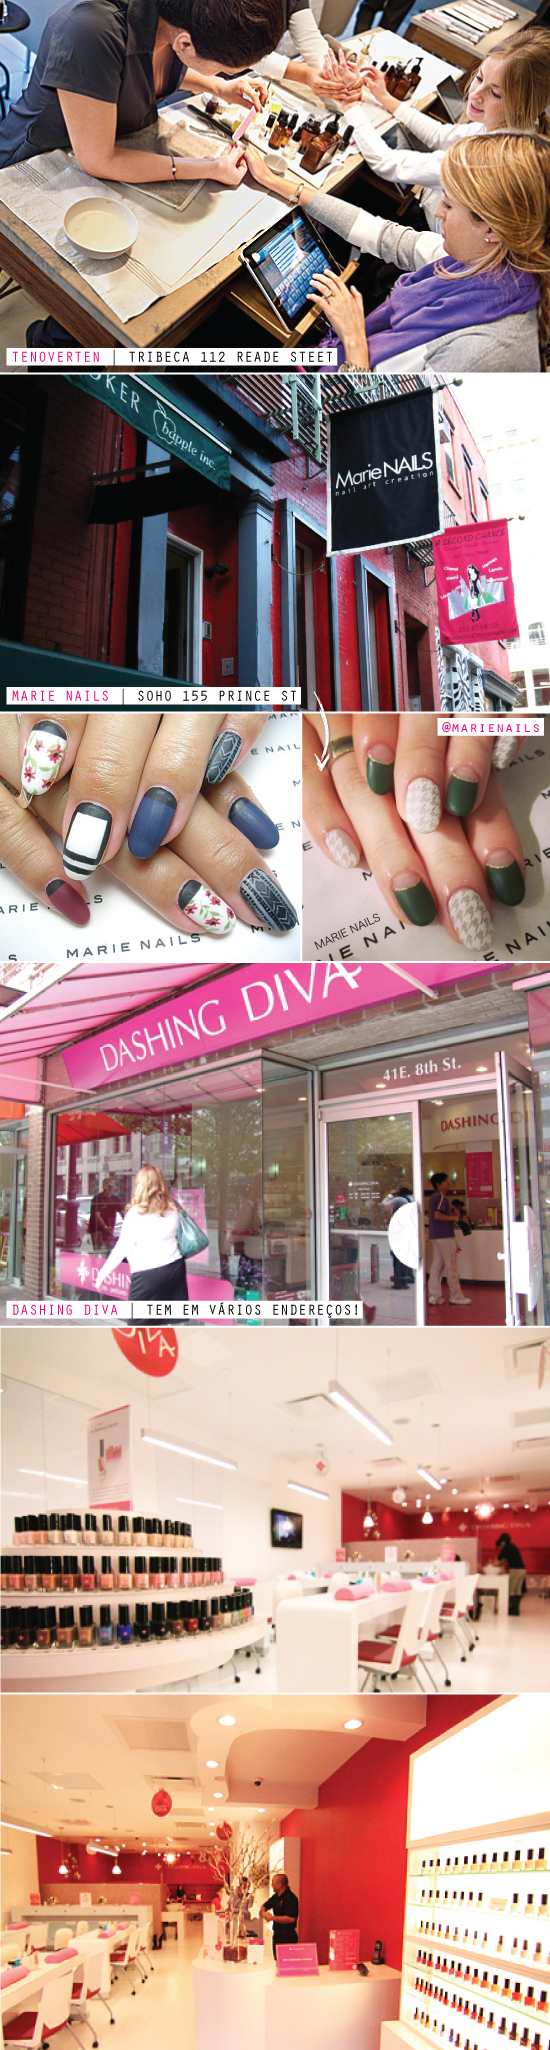 NY-UNHAS-manicure-salao-onde-fazer-indicacao-nail-art-decoradas-dica-viagem-beleza-esmalte-salon-dica-tips-travel-blog-studio-l-midtown-marie-dashing-diva-tenoverten-beauty